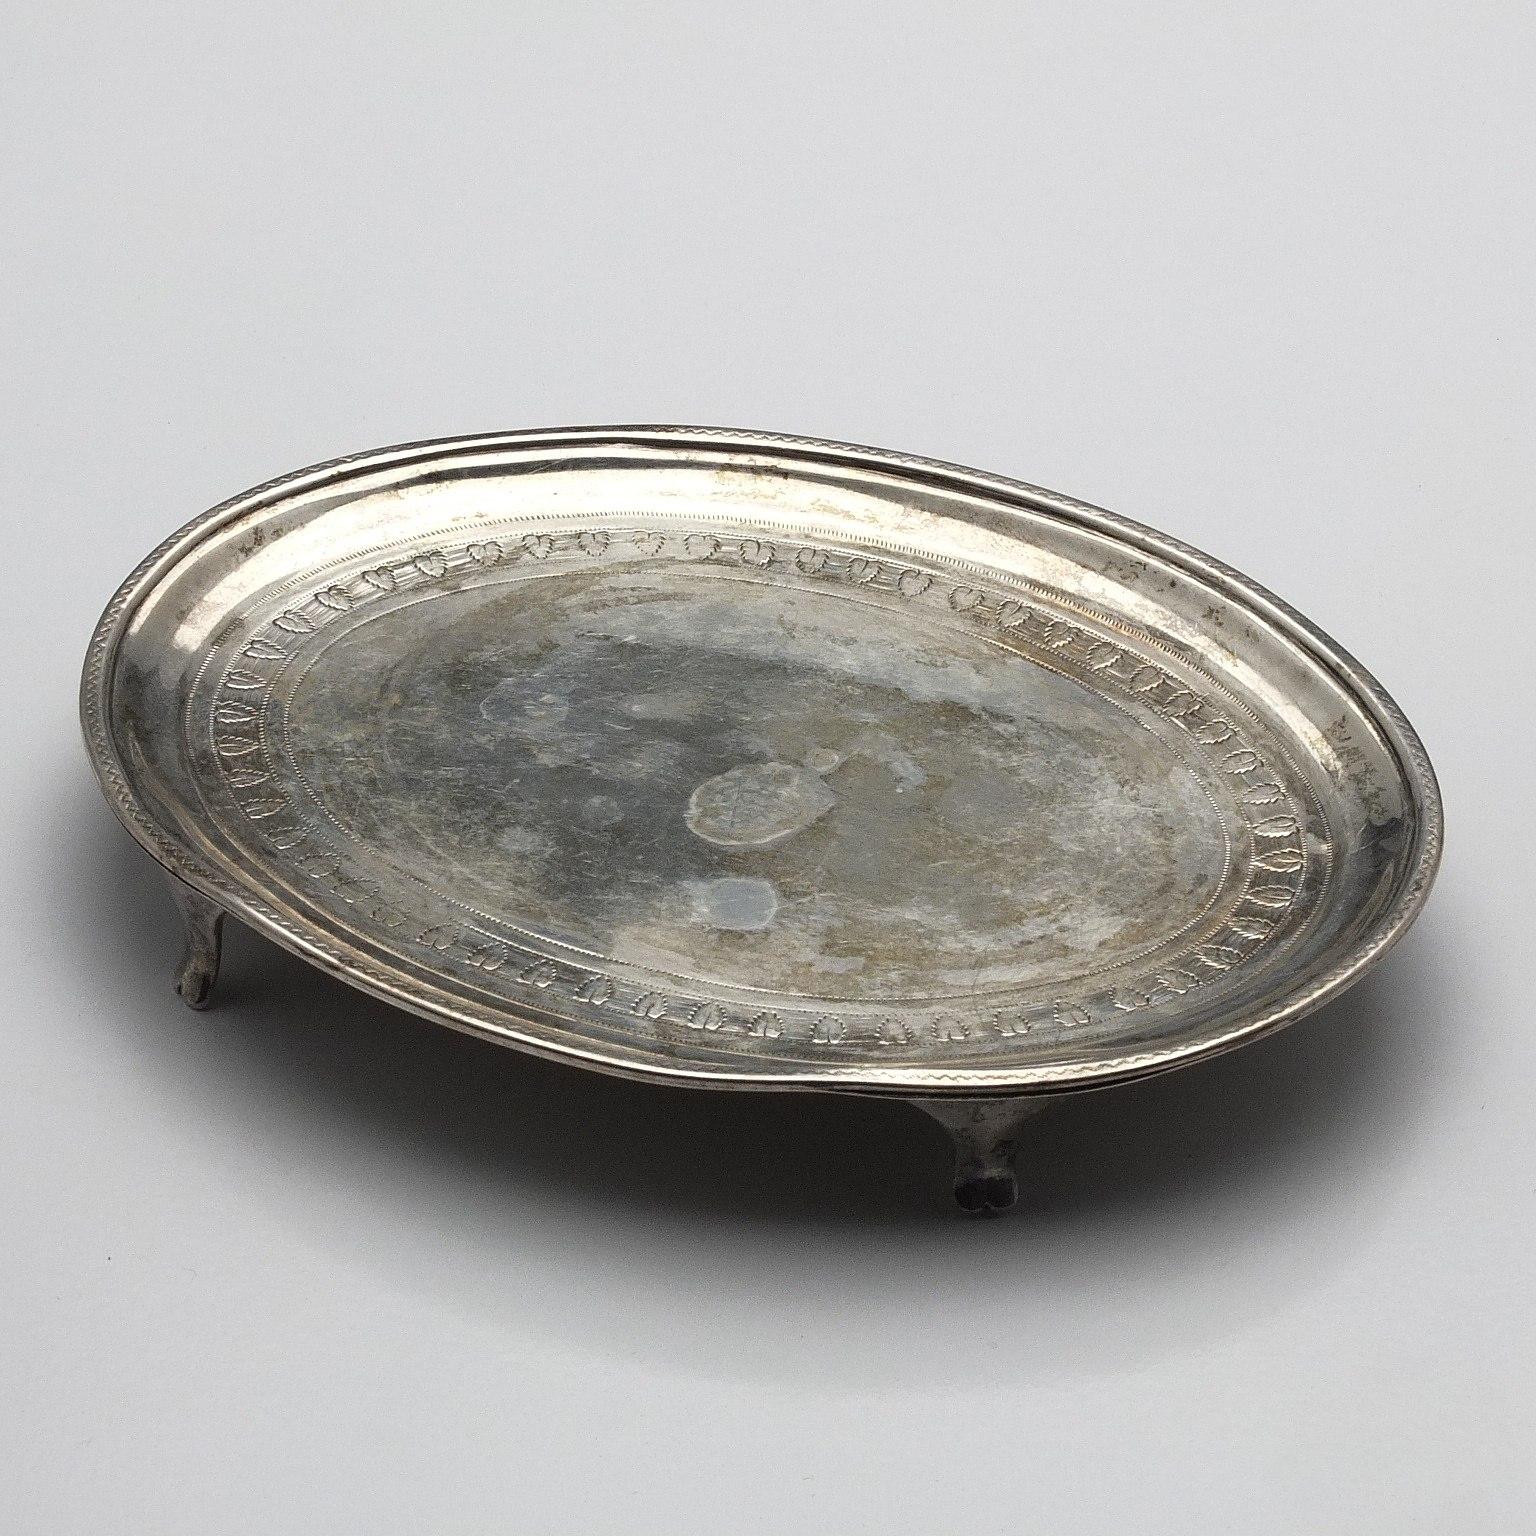 'George III Sterling Silver Bright Cut Trivet London 1801'